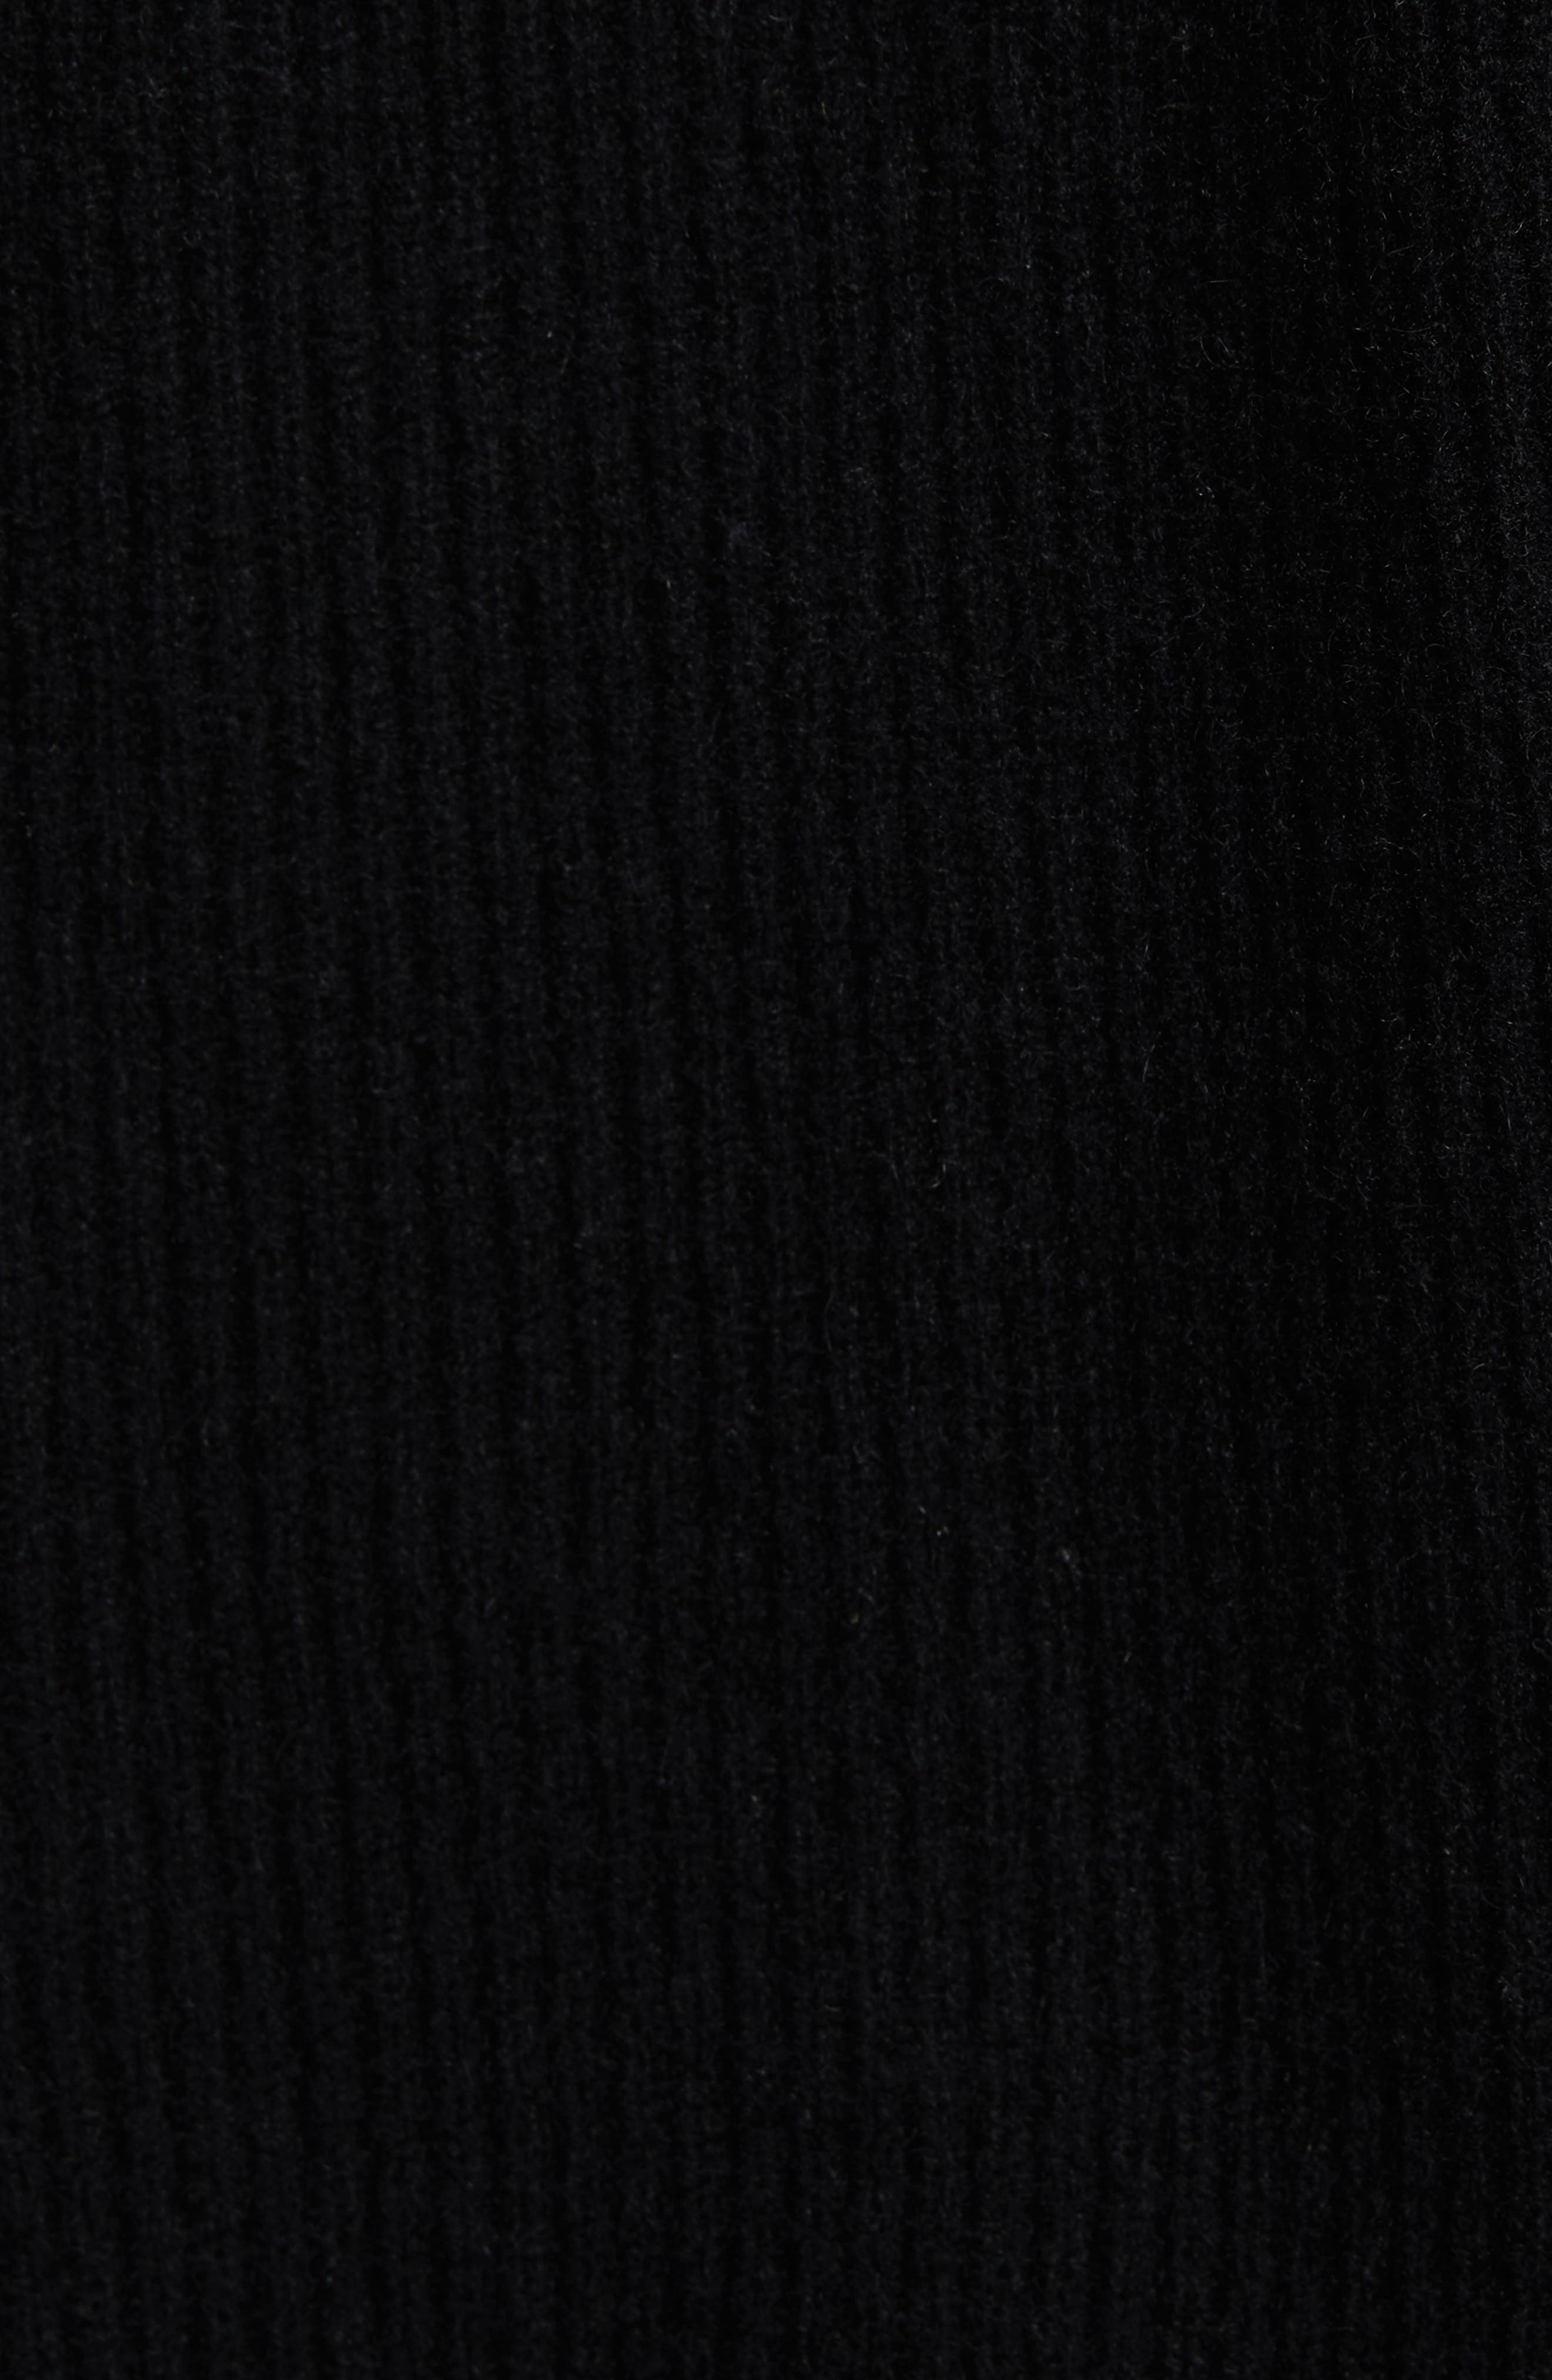 Diagonal Rib Wool & Cashmere Sweater,                             Alternate thumbnail 5, color,                             001